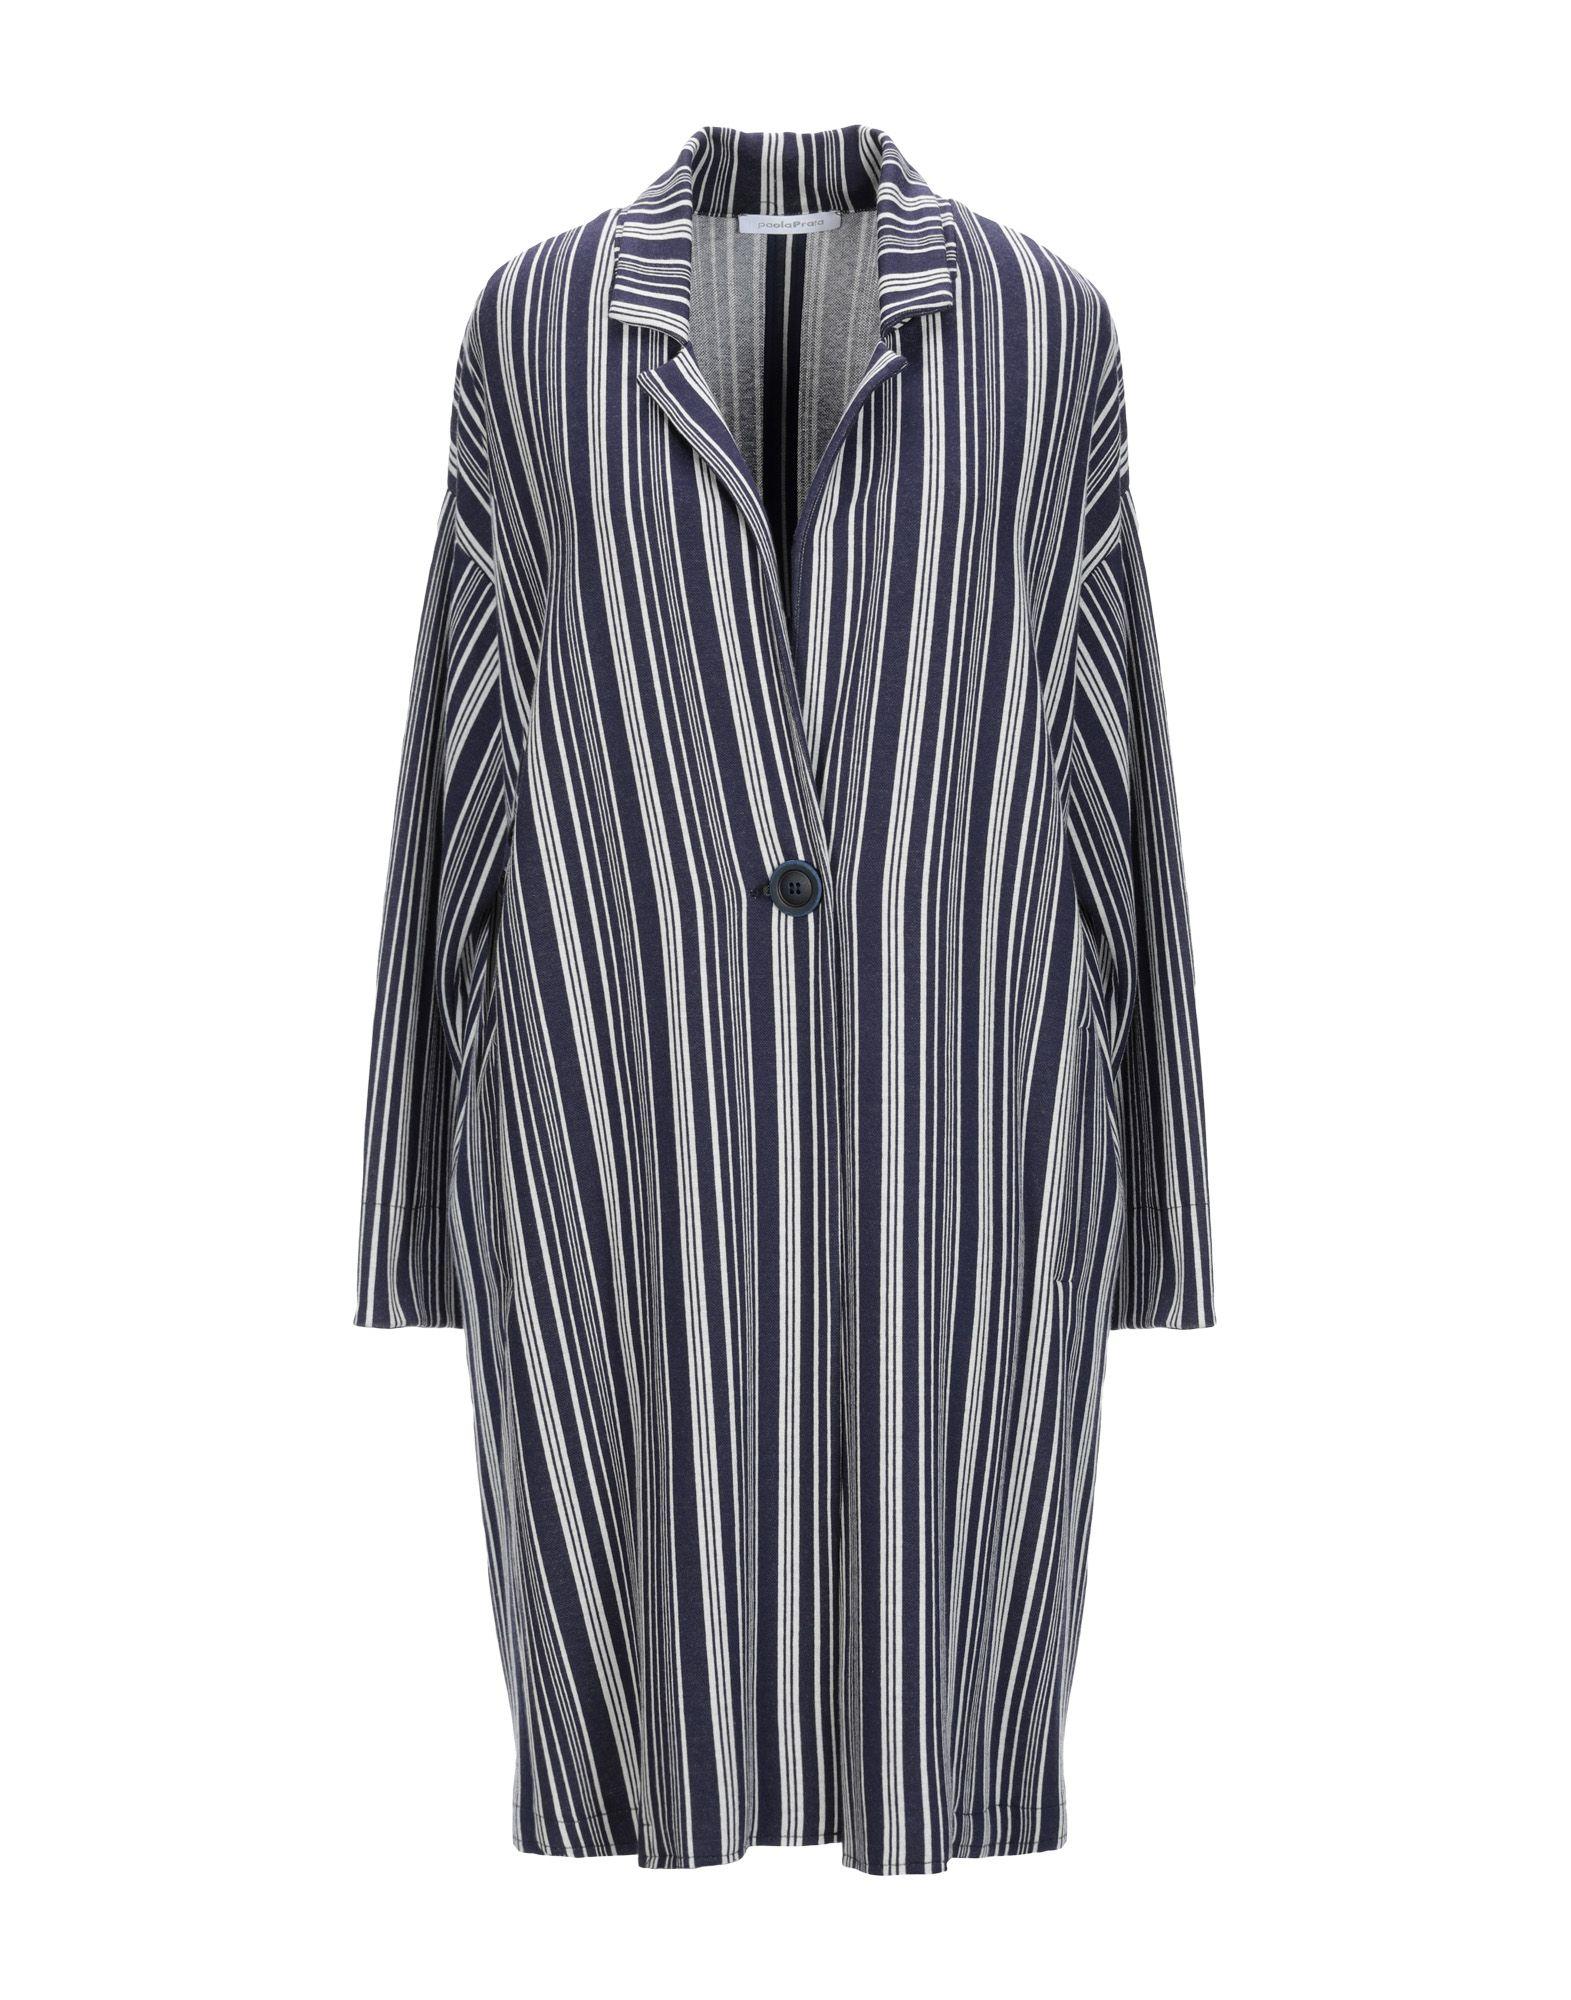 PAOLA PRATA Легкое пальто paola prata легкое пальто